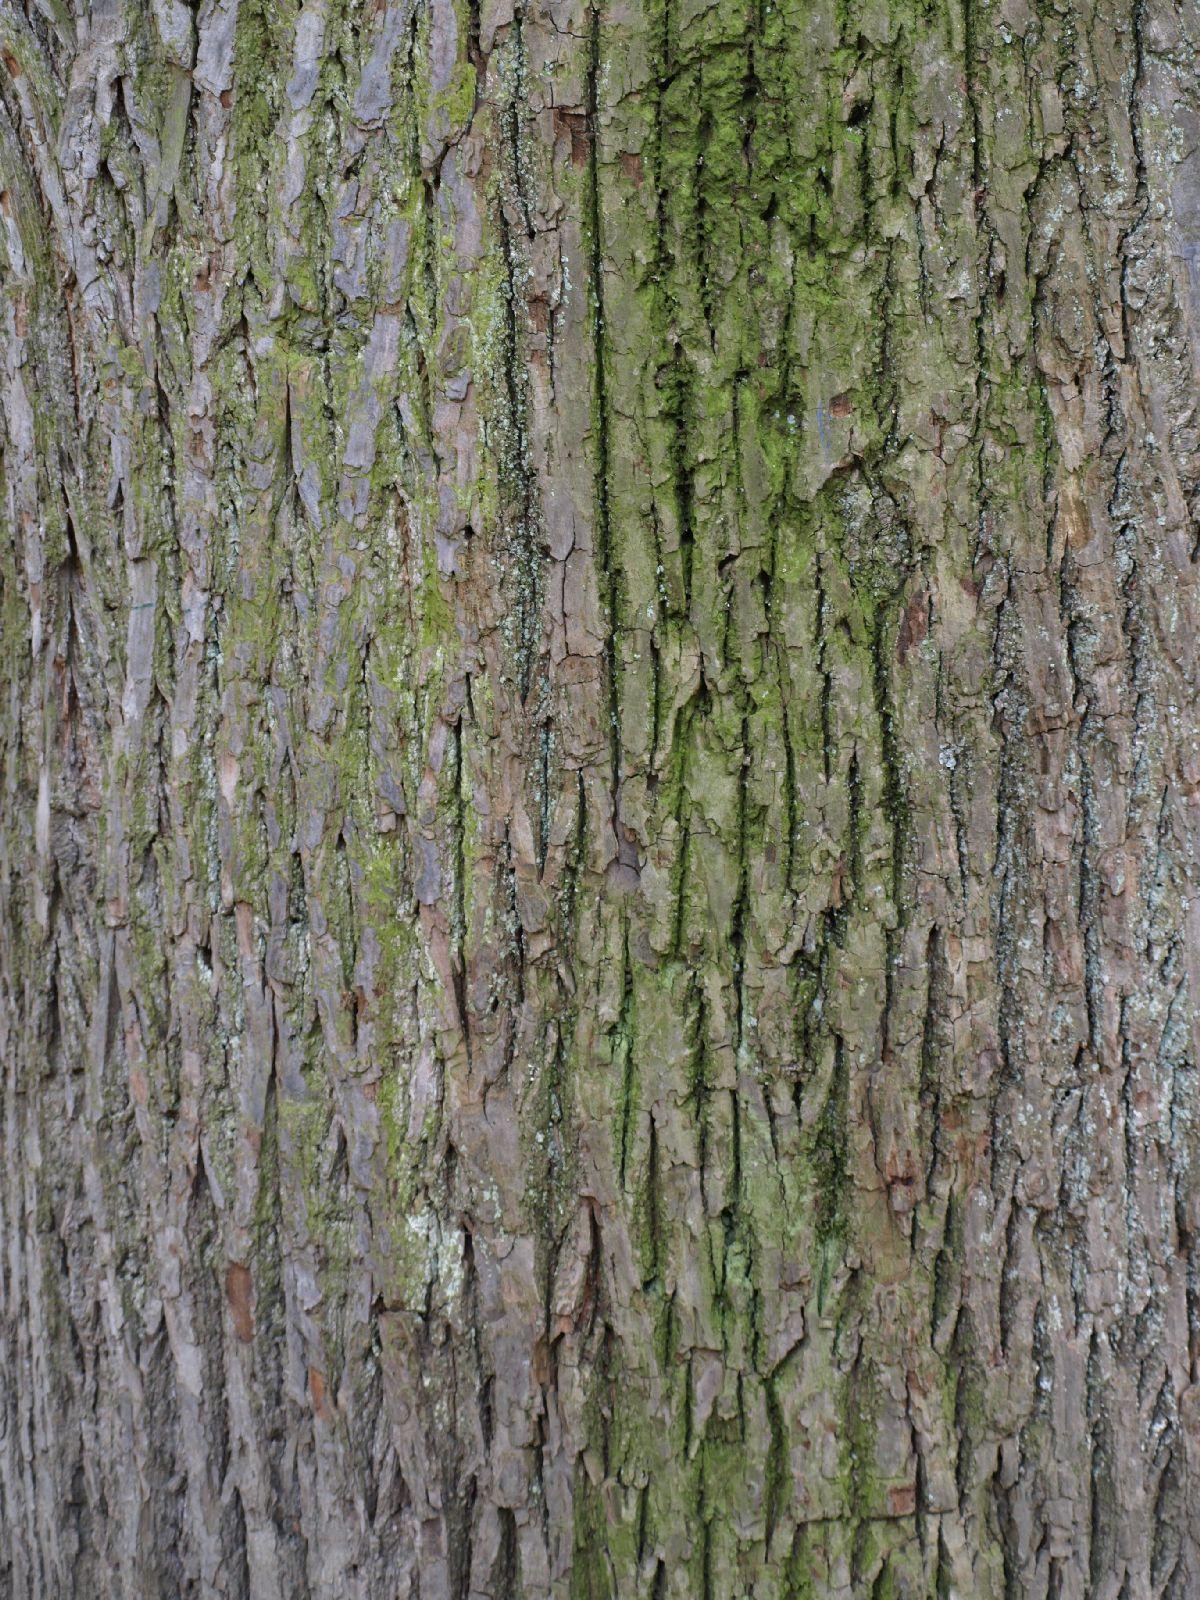 Baum-Rinde_Textur_A_P4120932